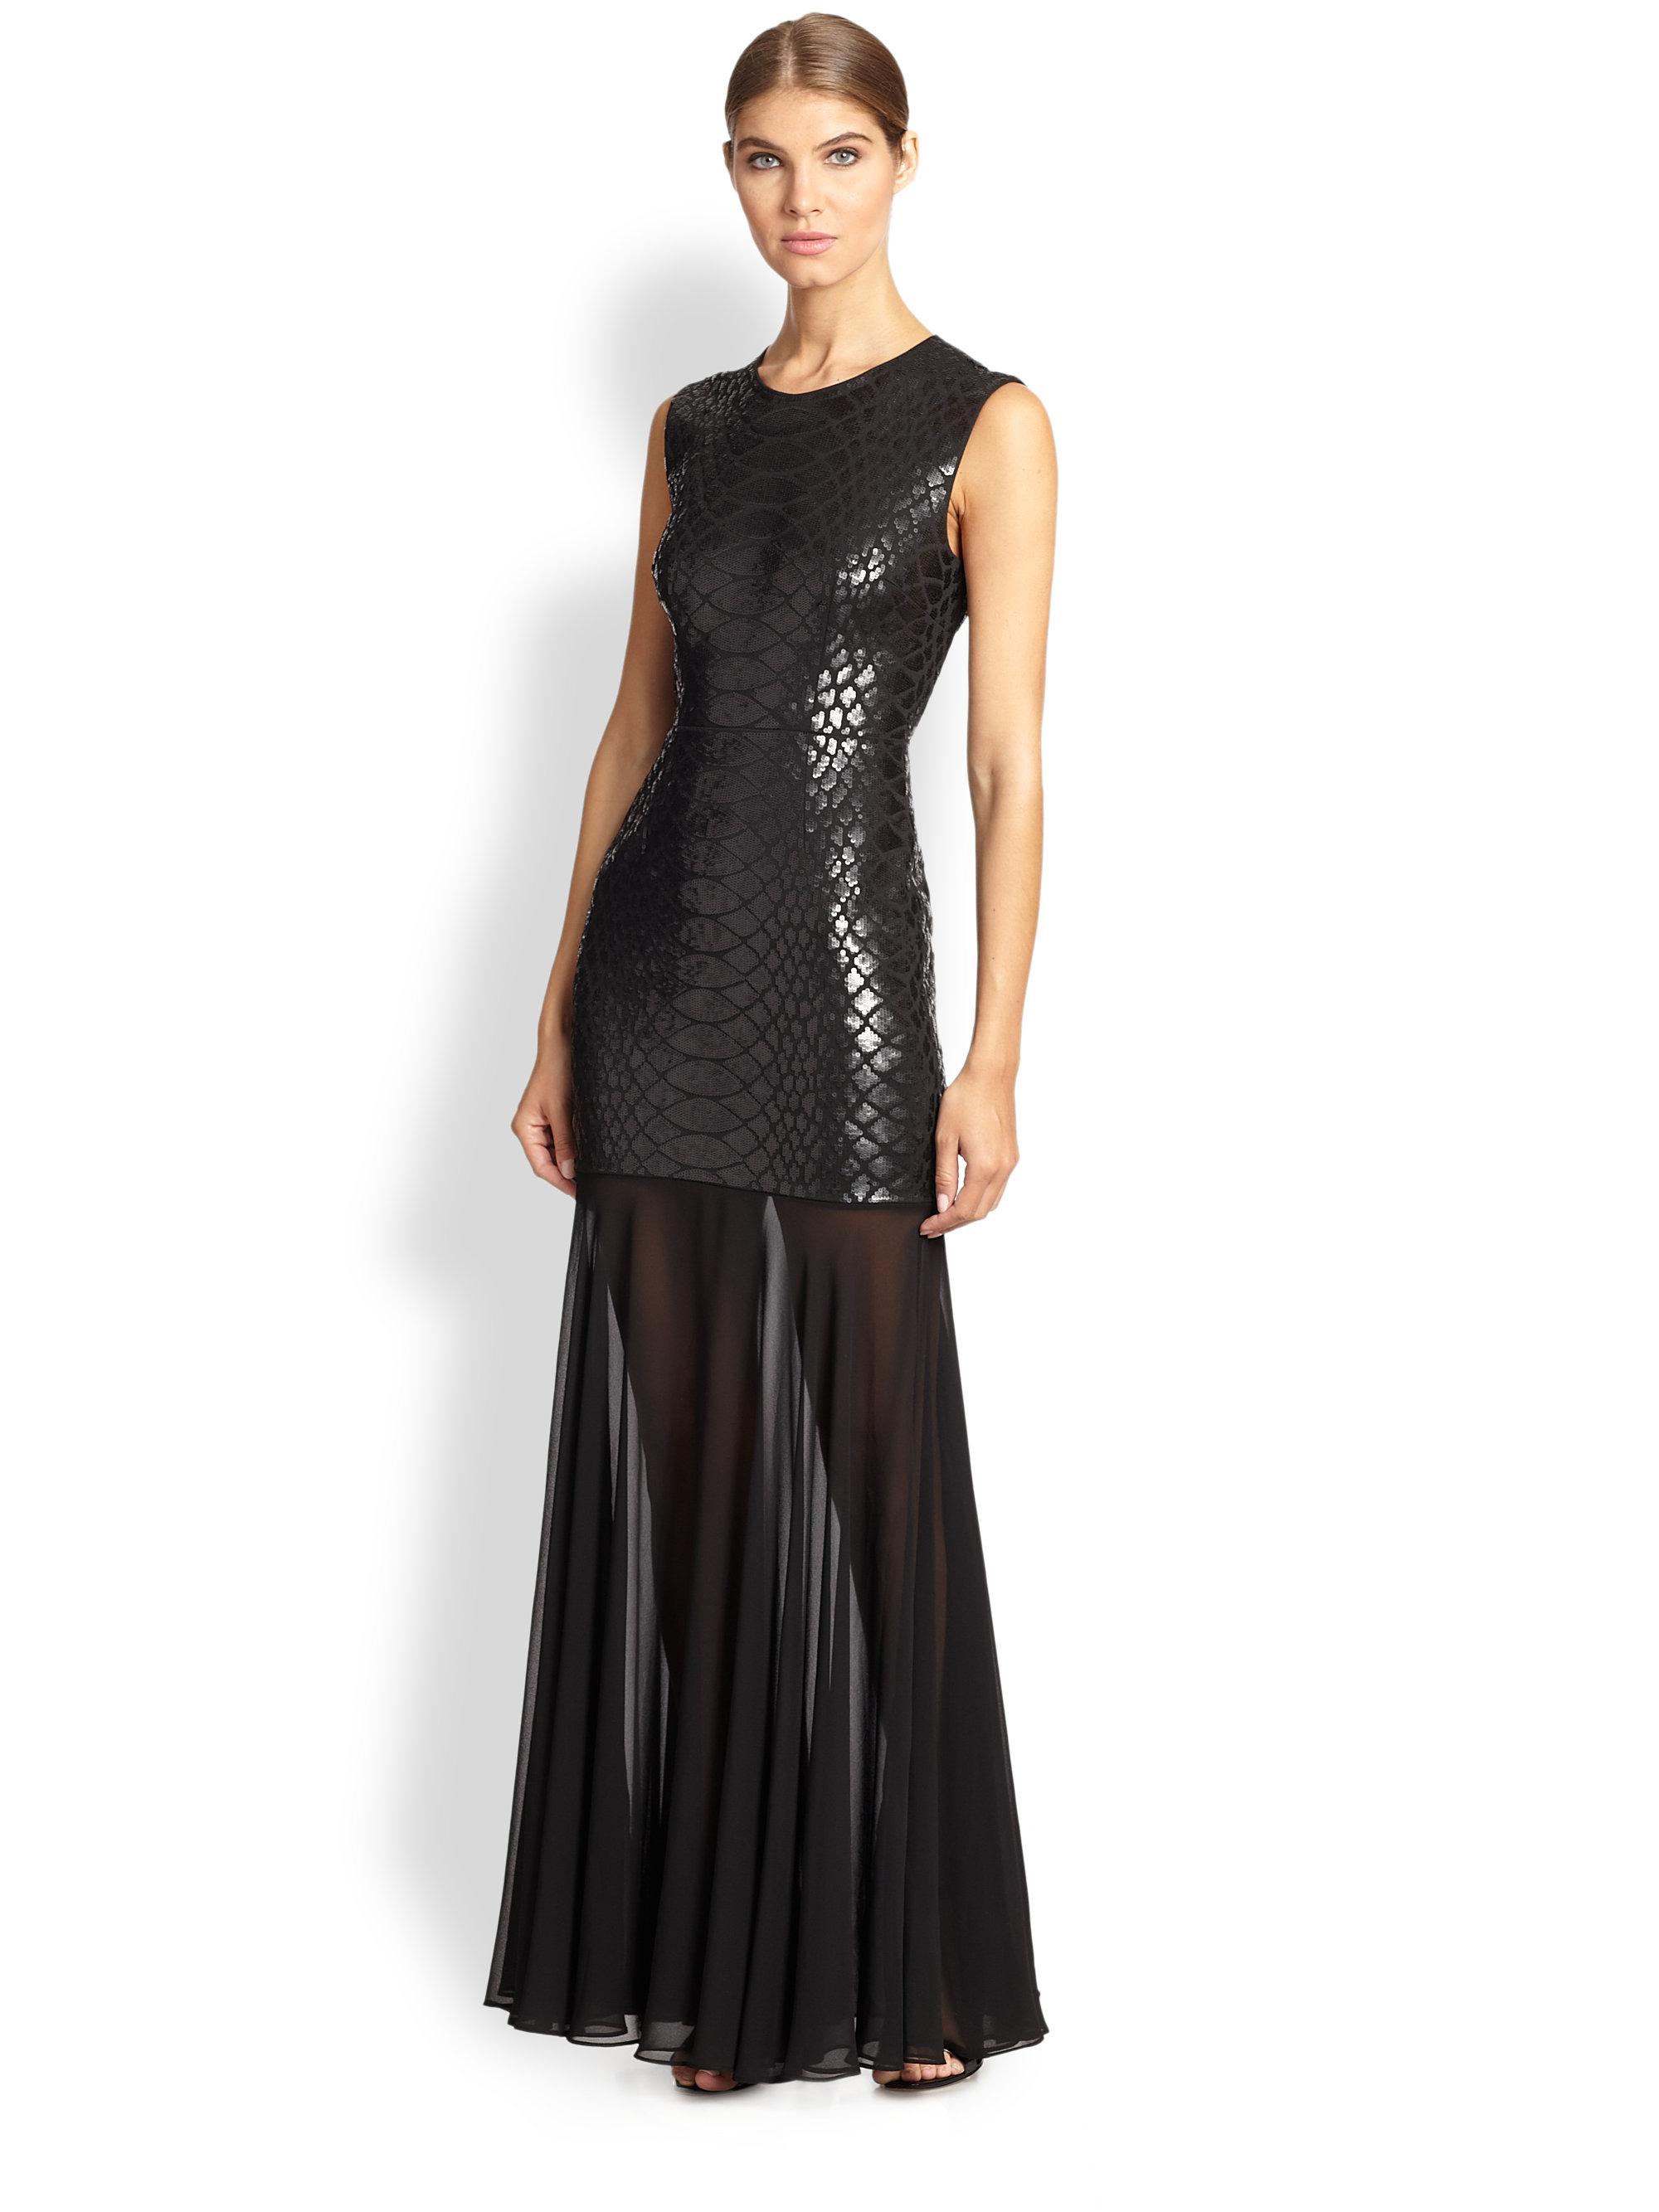 Lyst - Bcbgmaxazria Marielle Python-Sequined Gown in Black